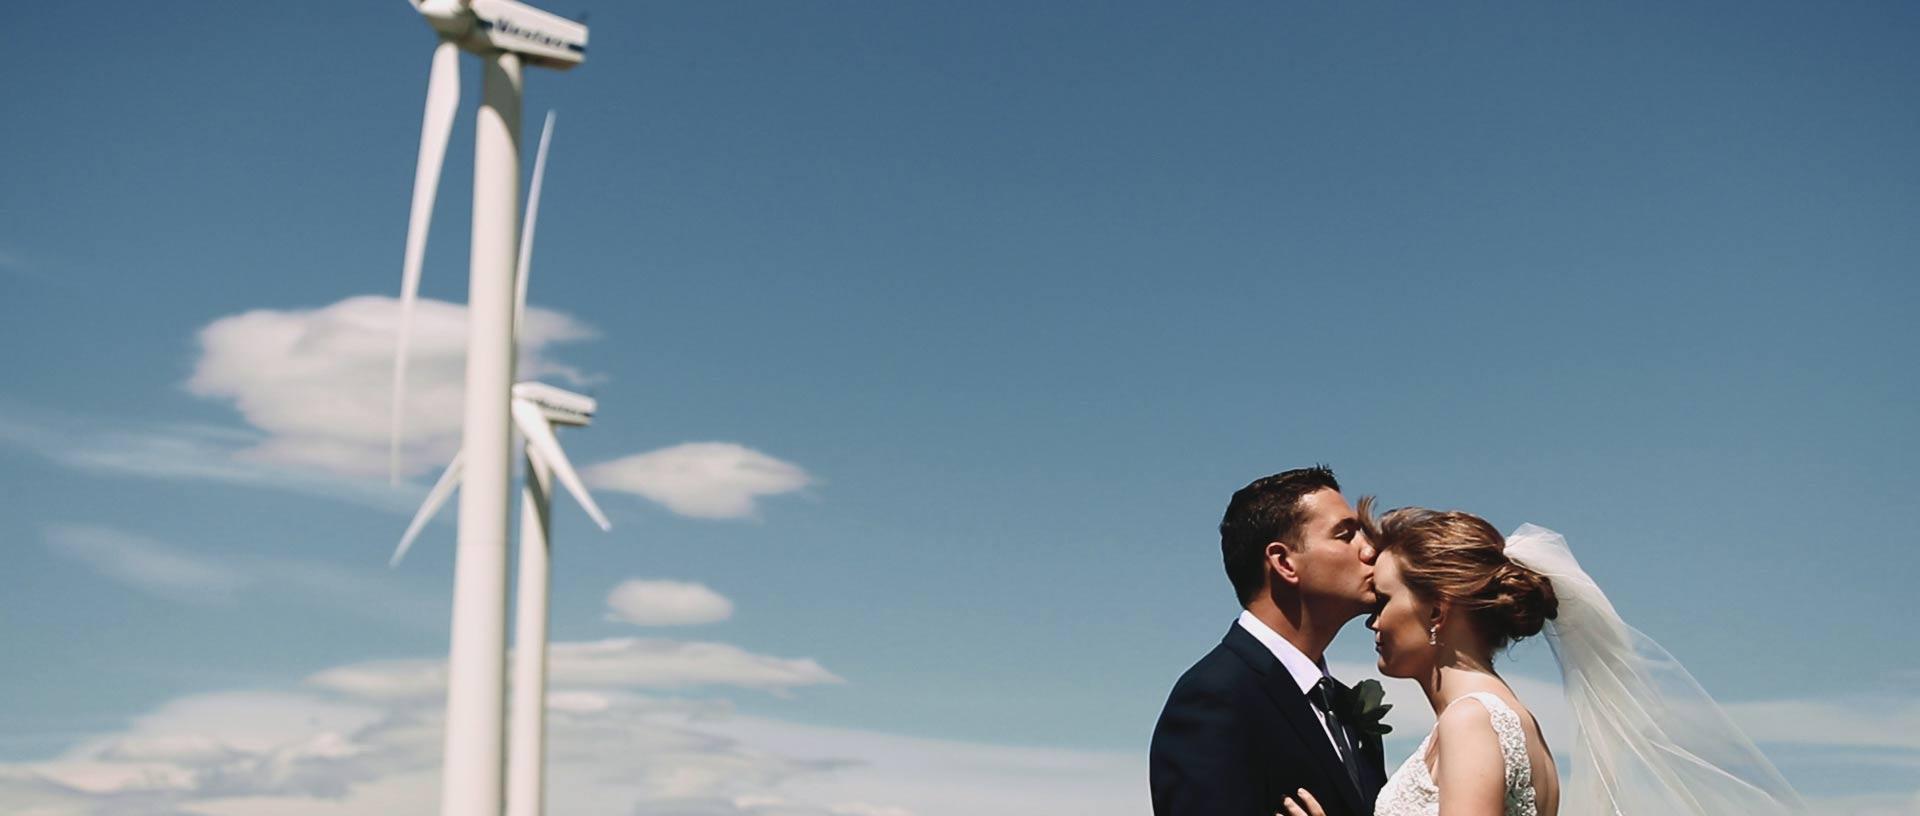 wedding videography Edmonton